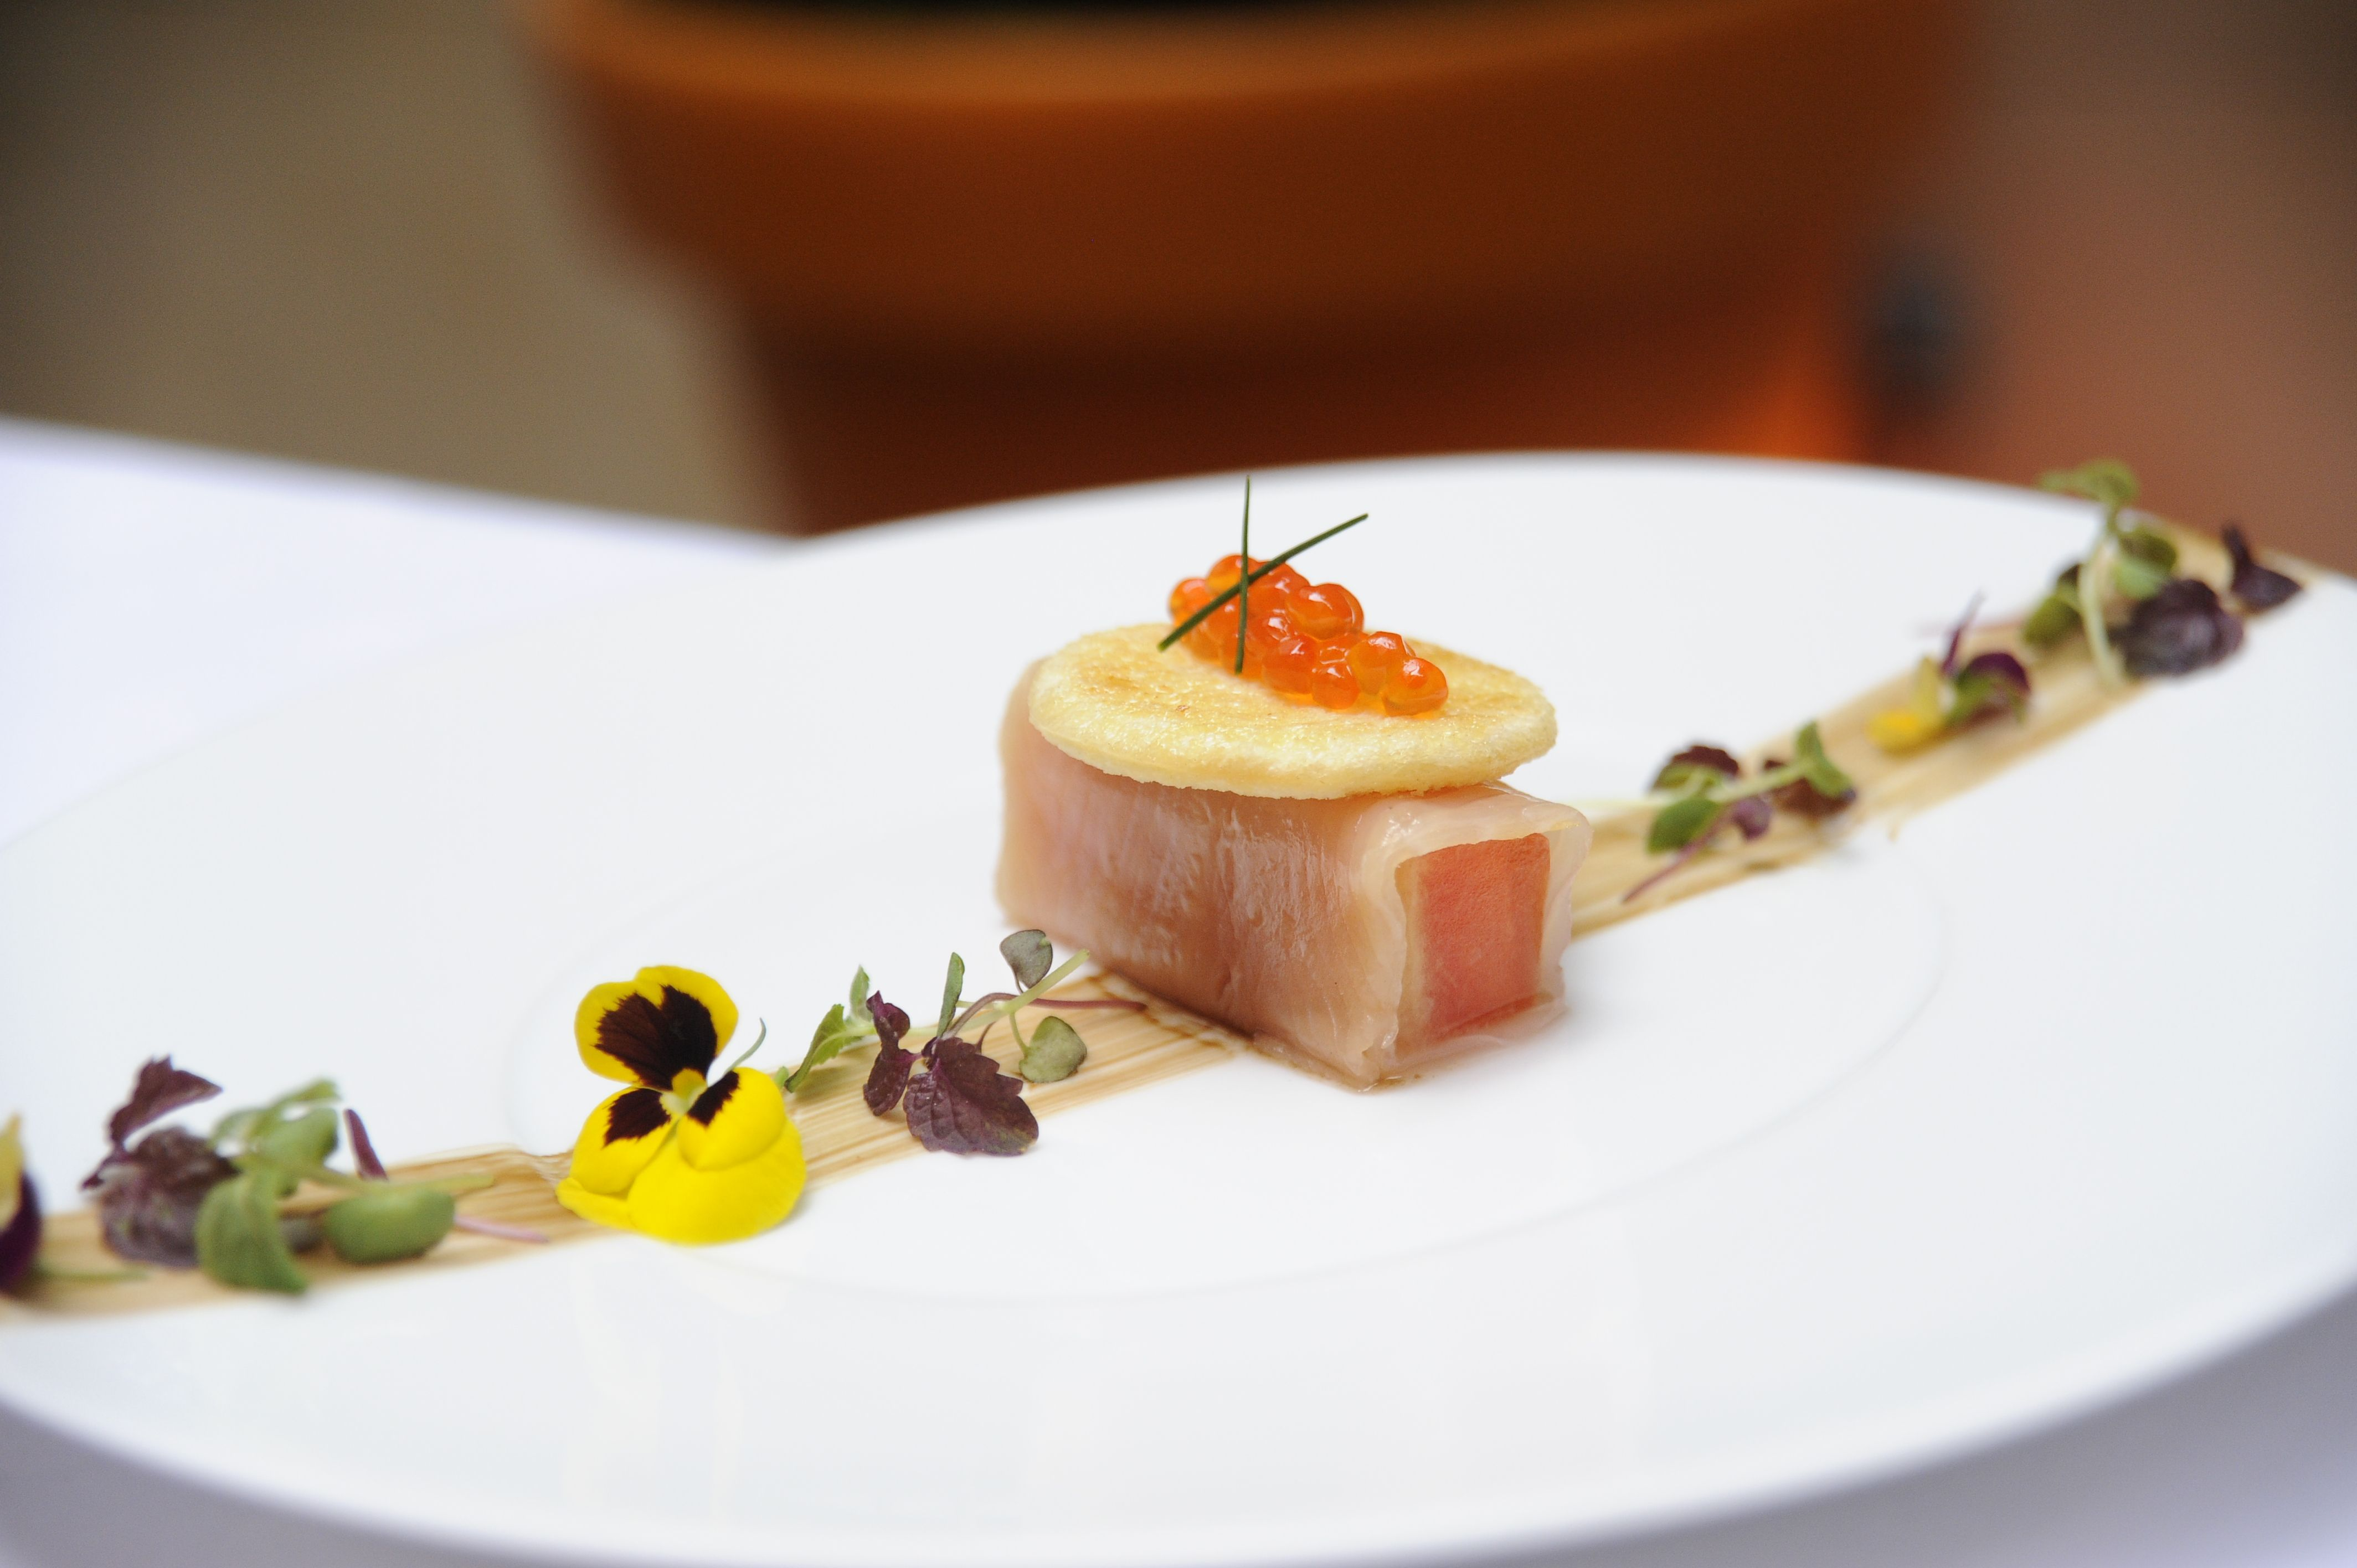 Smoked Salmon From La Pointe Du Raz Watermelon Balsamic Cream - Luxury food presentation template ideas